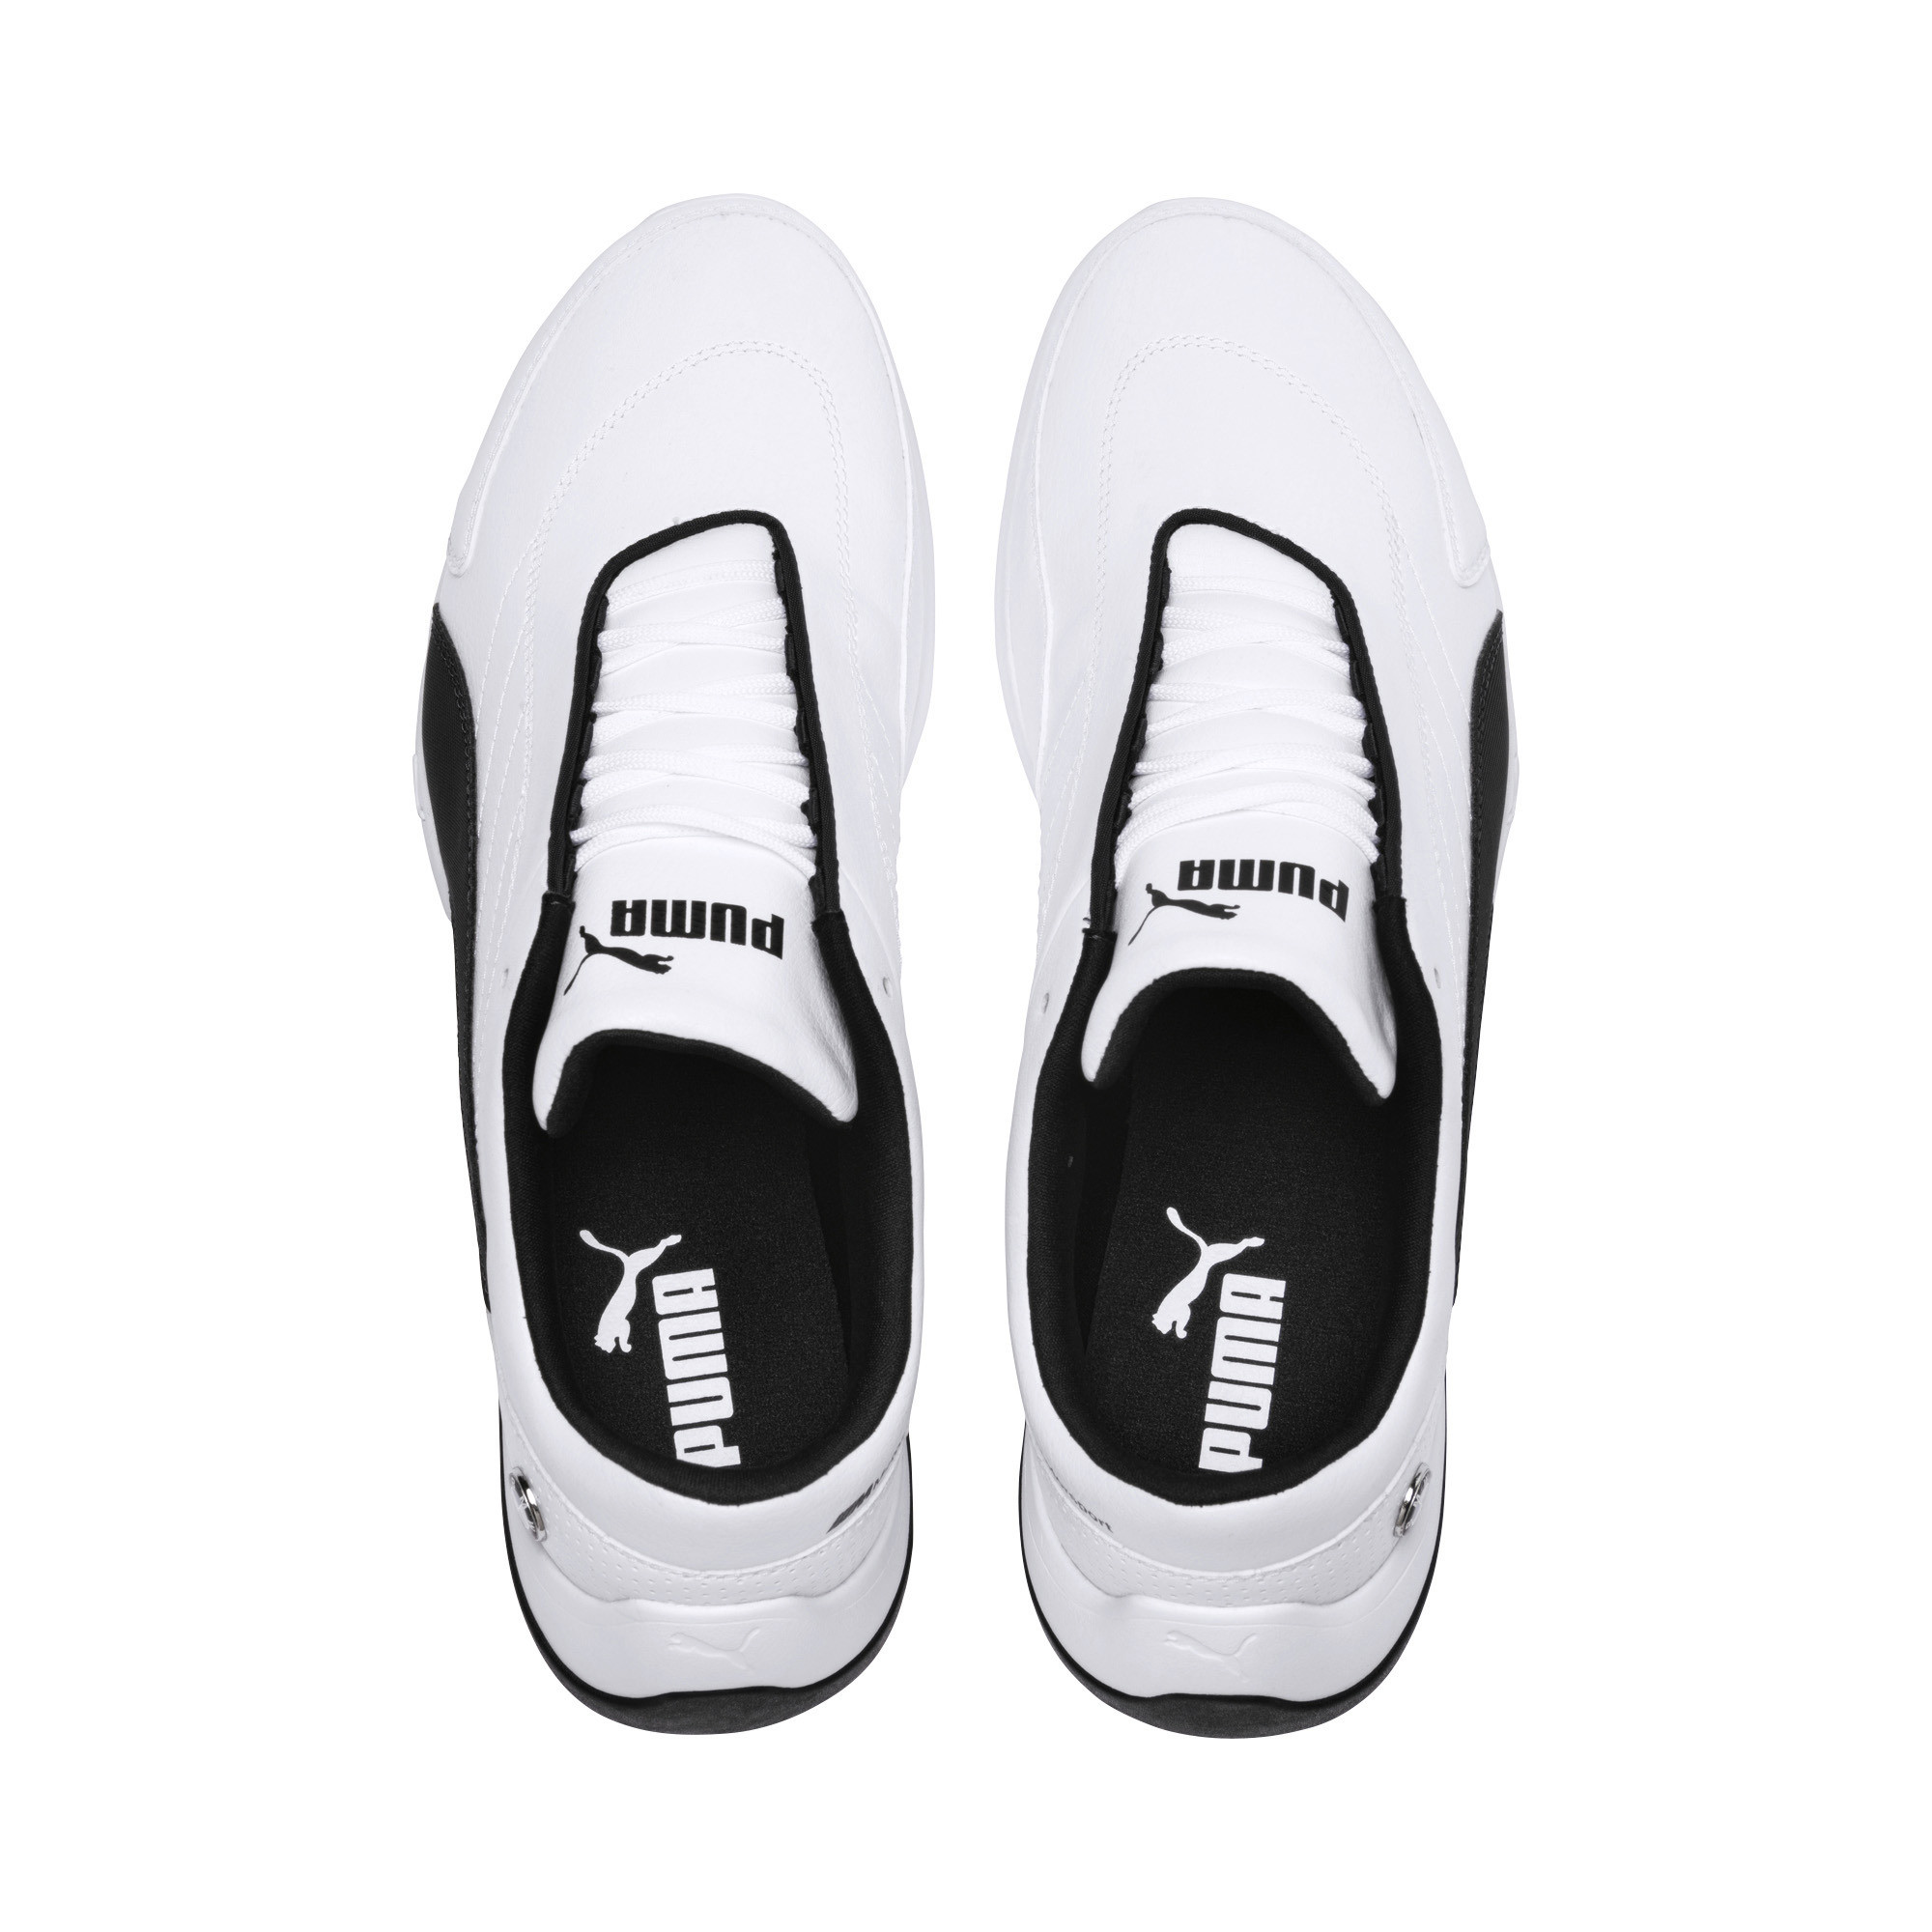 PUMA-Men-039-s-BMW-M-Motorsport-Kart-Cat-III-Shoes thumbnail 16